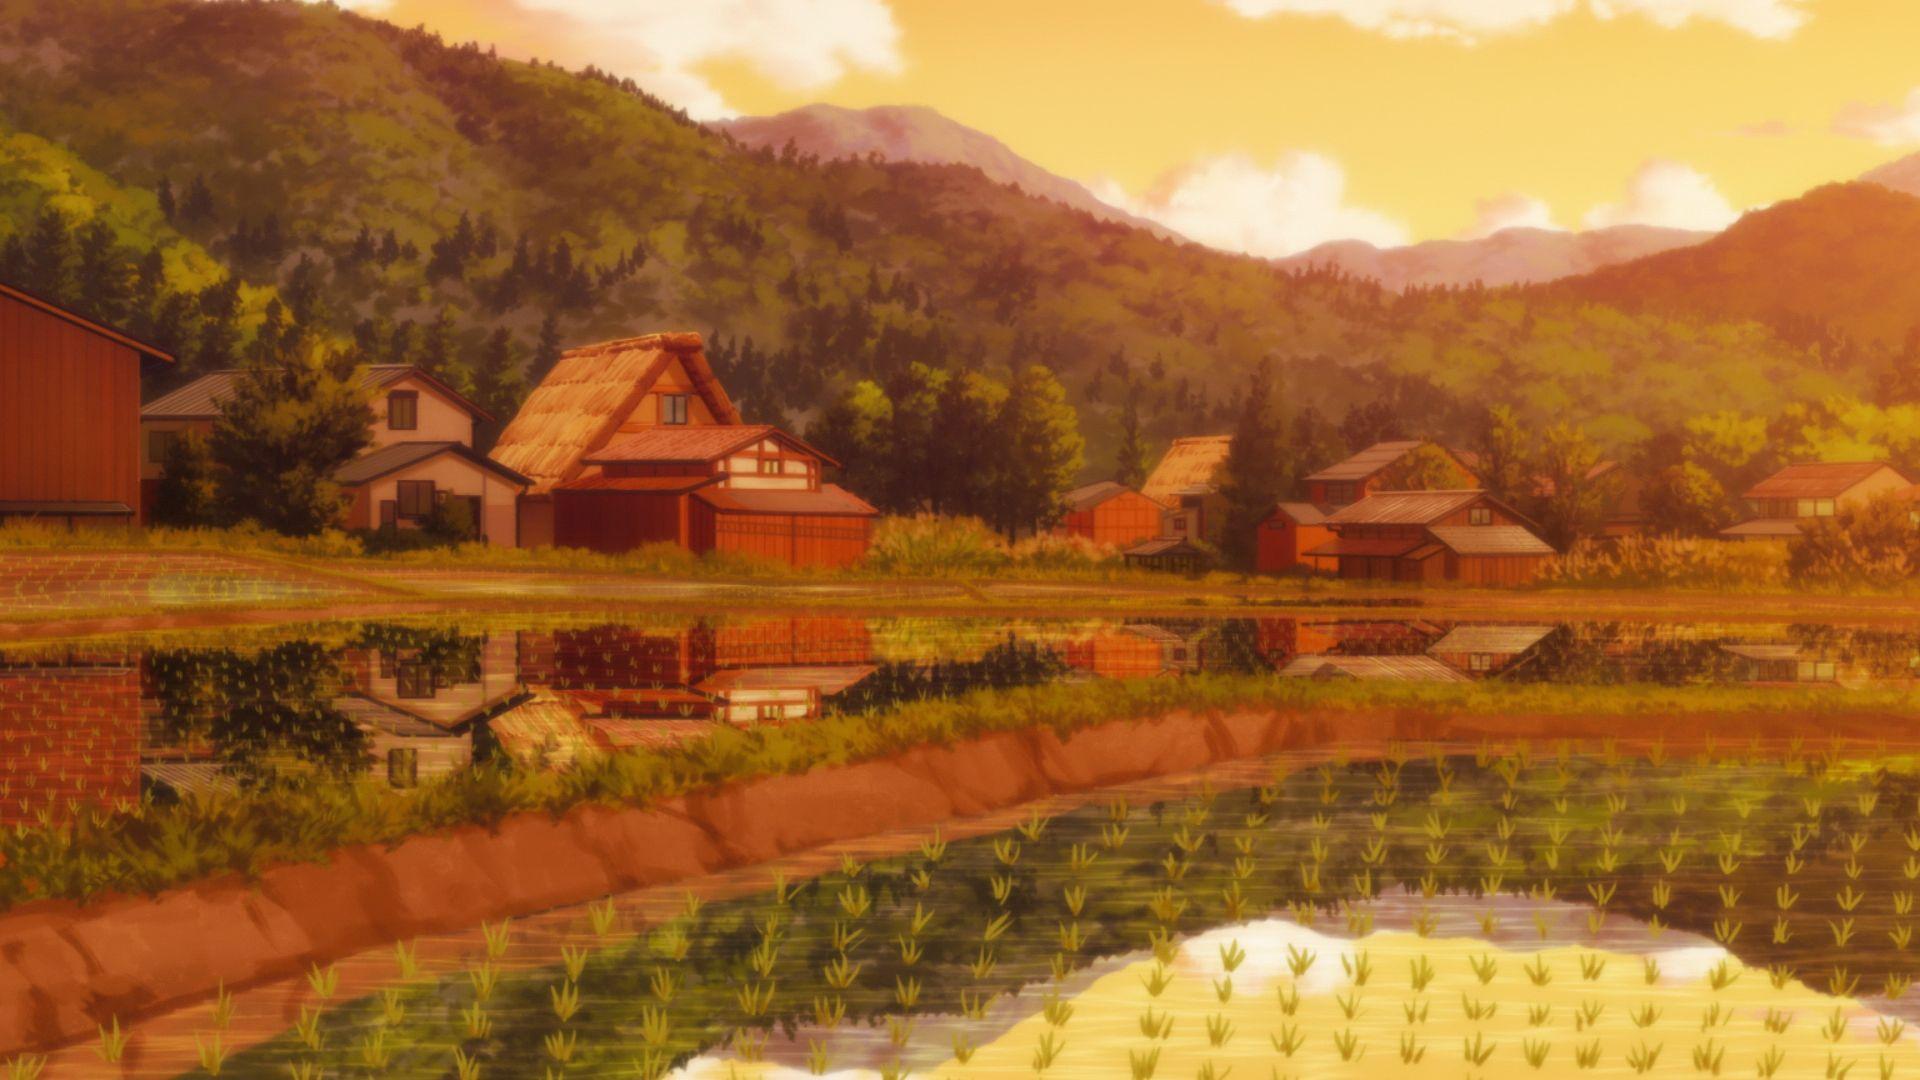 Higurashi no Naku Koro ni - recenzja anime jesień 2020 - rascal.pl